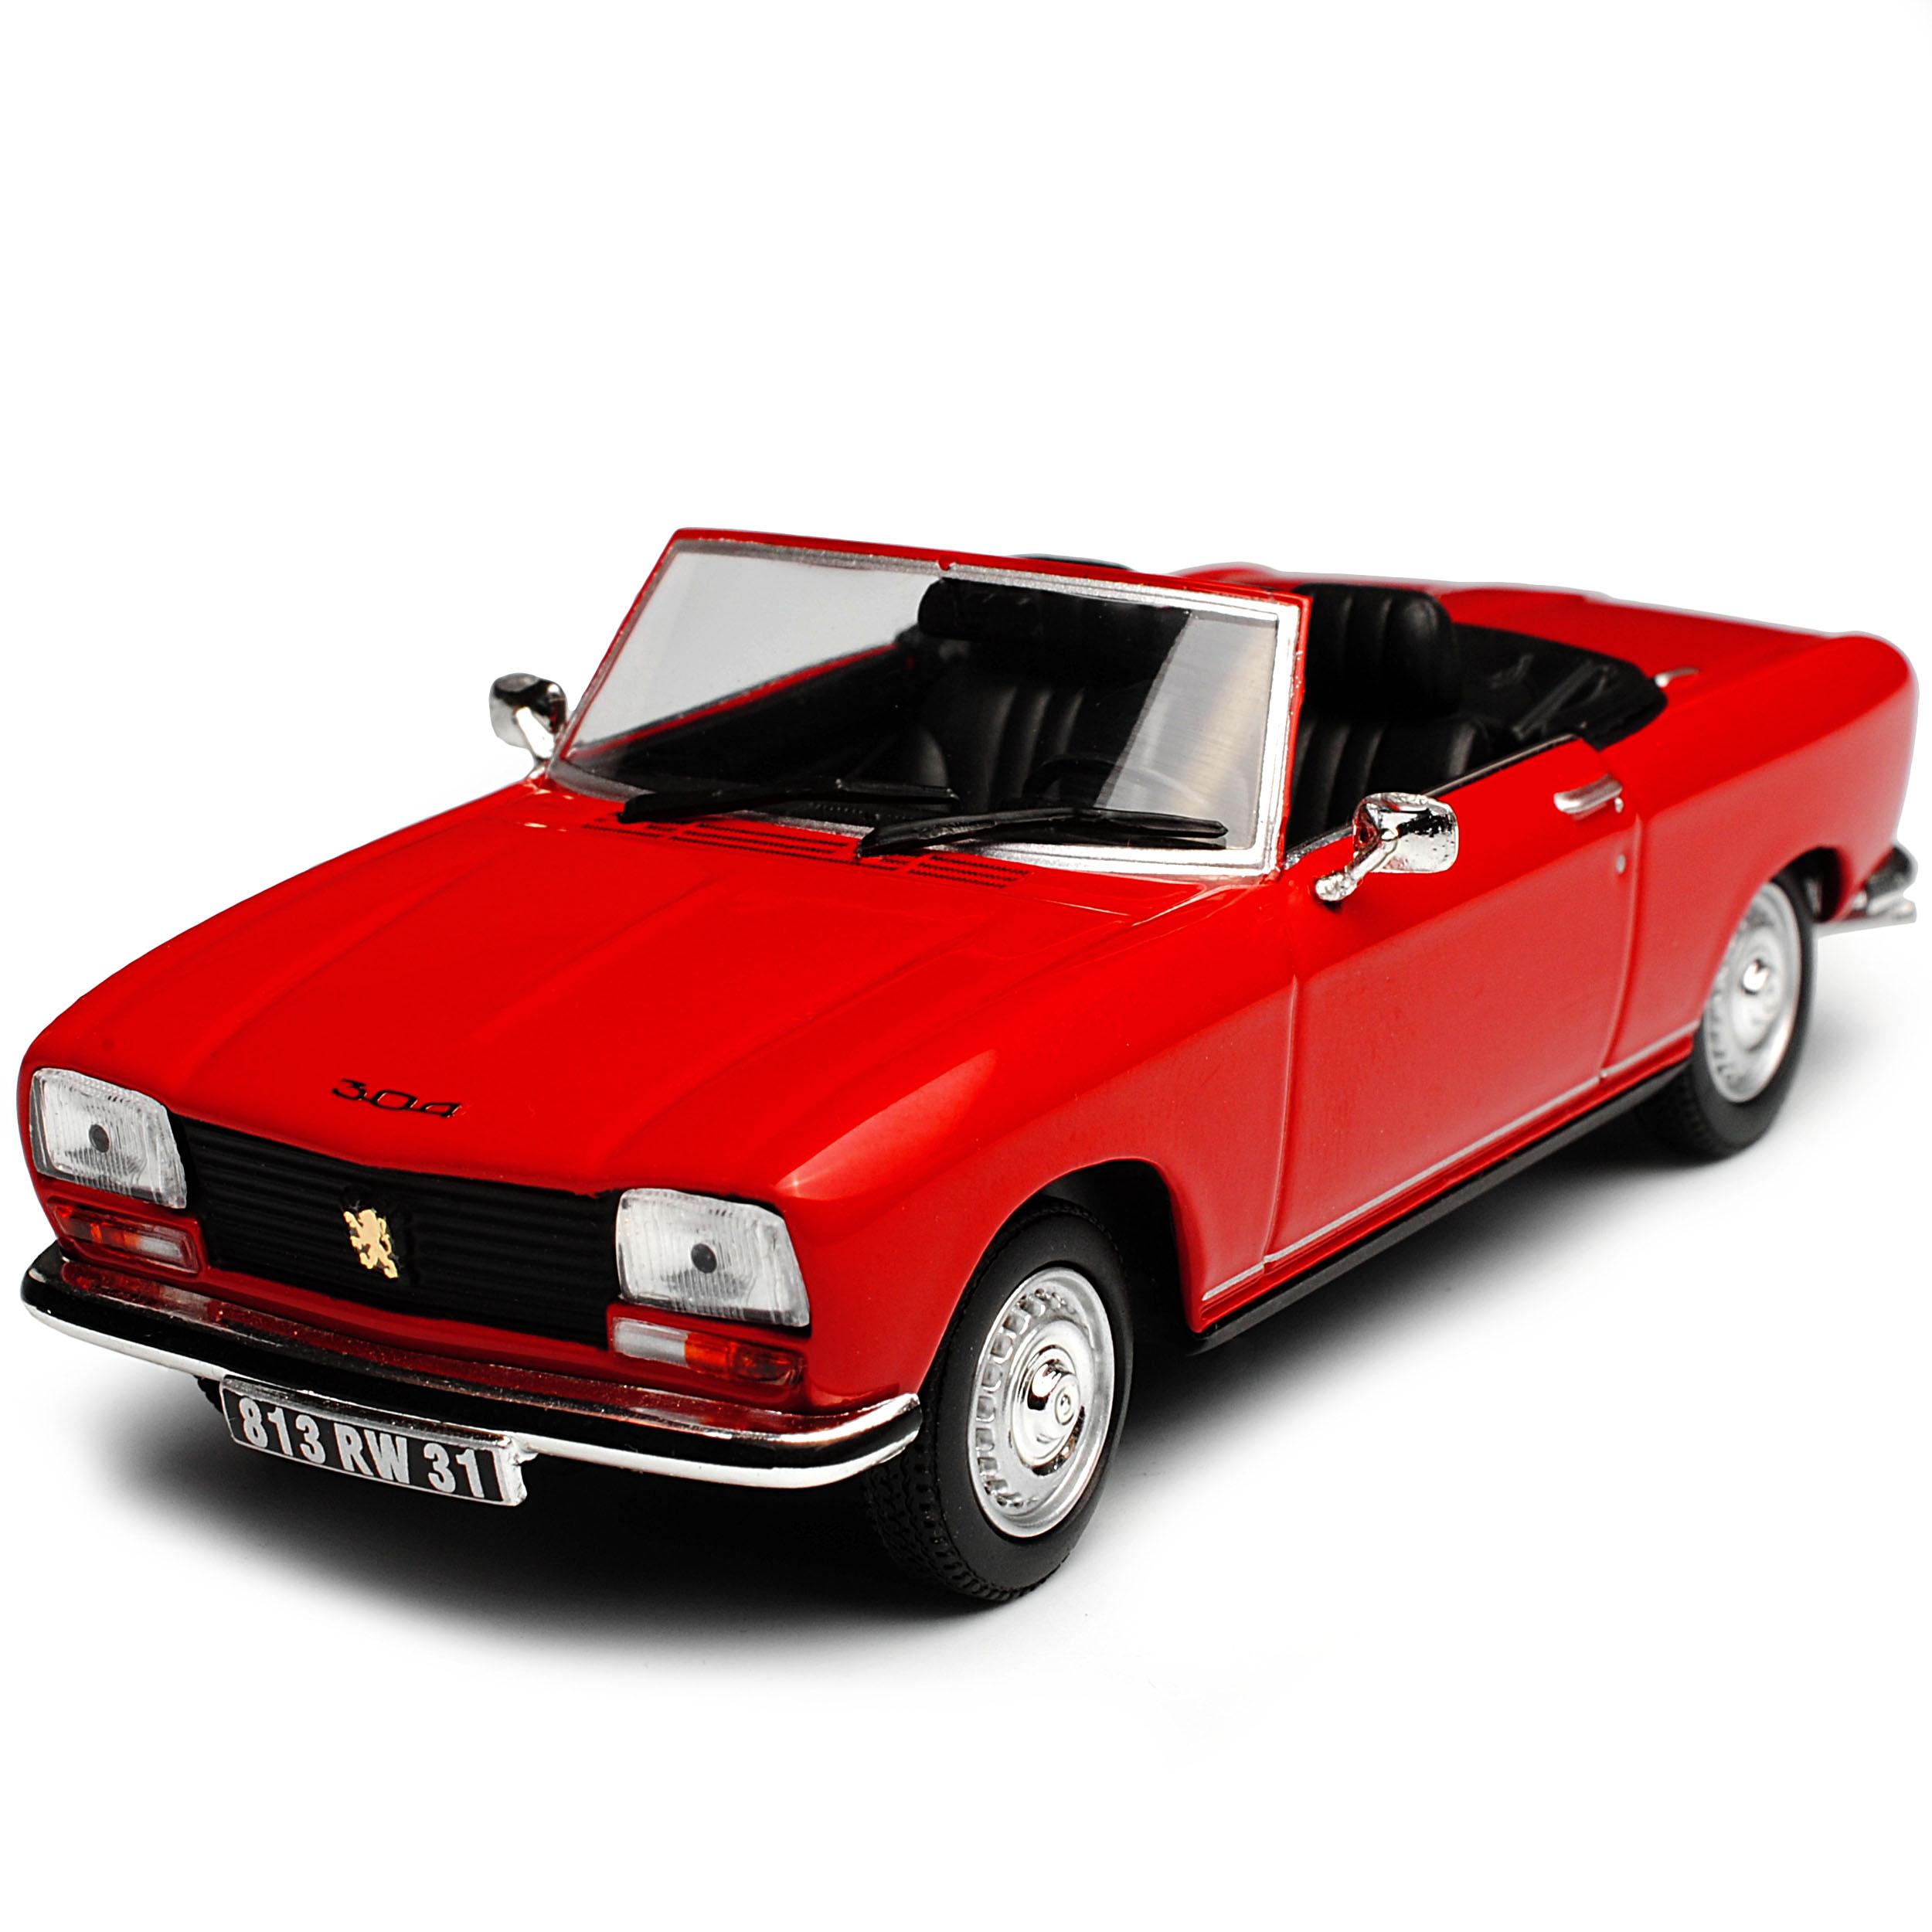 Peugeot 304 Cabriolet S Rot 1969-1980 1//43 Norev Modell Auto mit oder ohne ind..